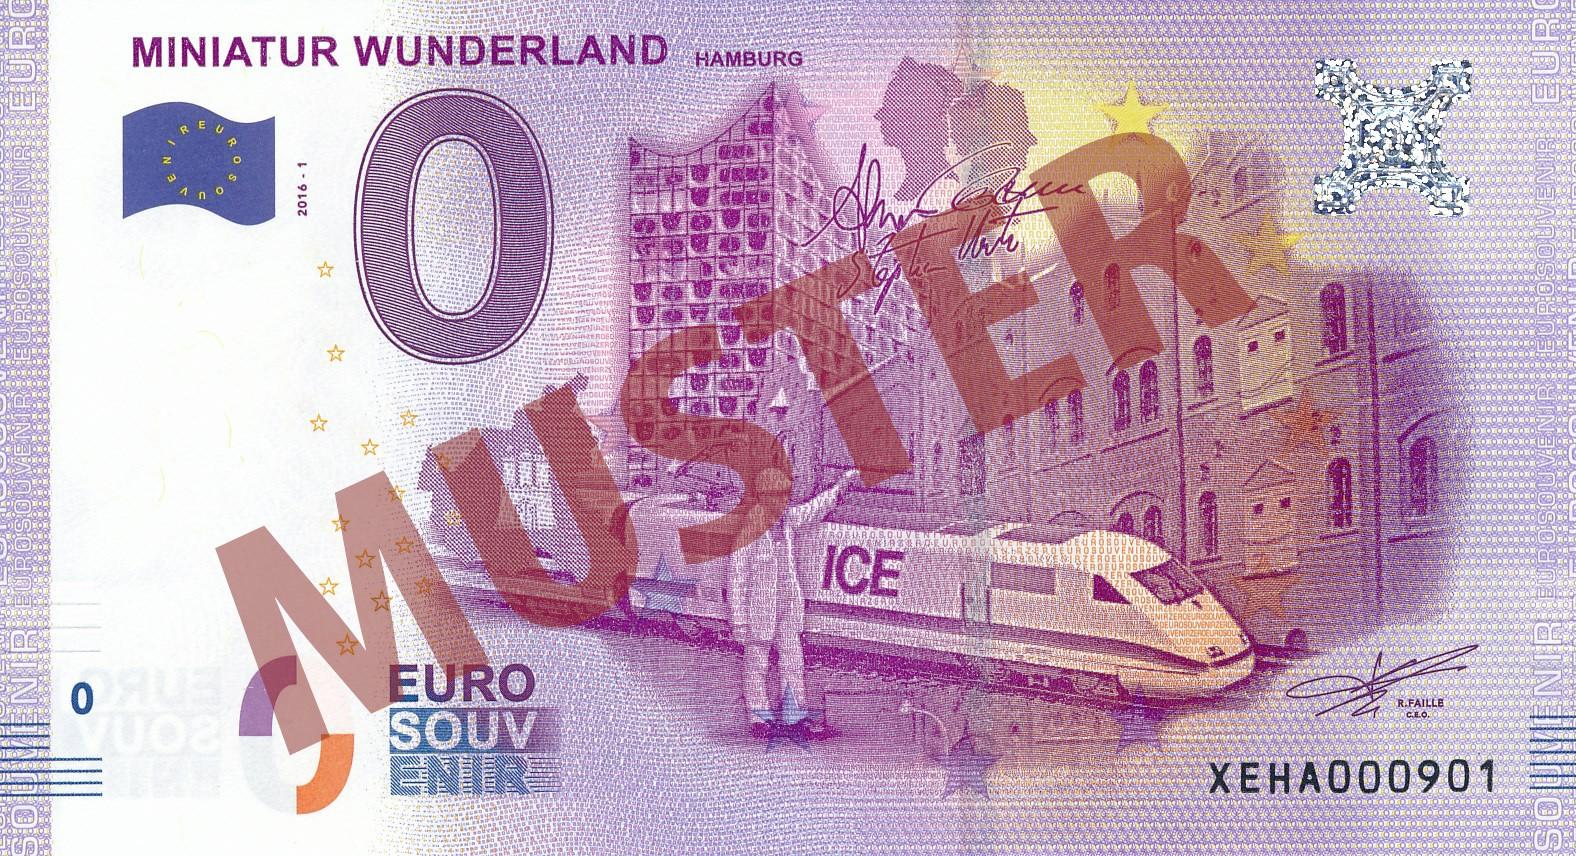 Miniatur Wunderland Euro-Souvenir-Banknote (1)